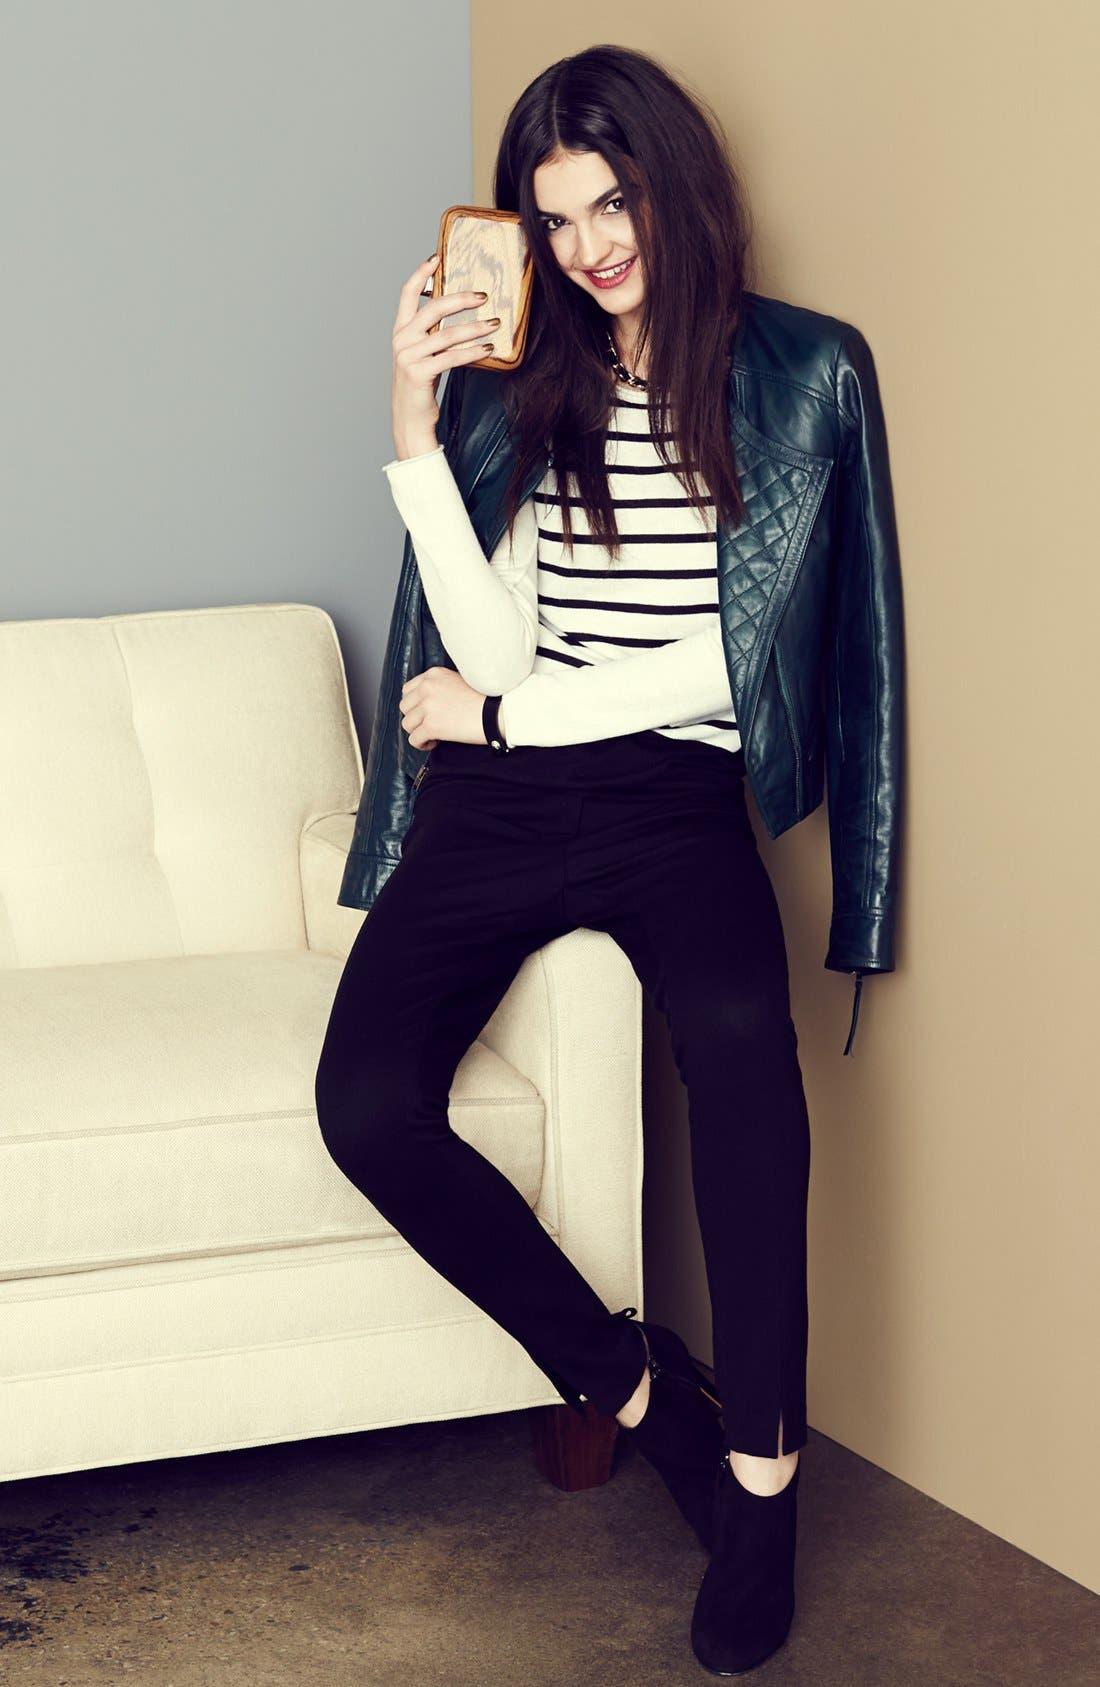 Main Image - Halogen® Jacket, Vince Camuto Sweater & Pants